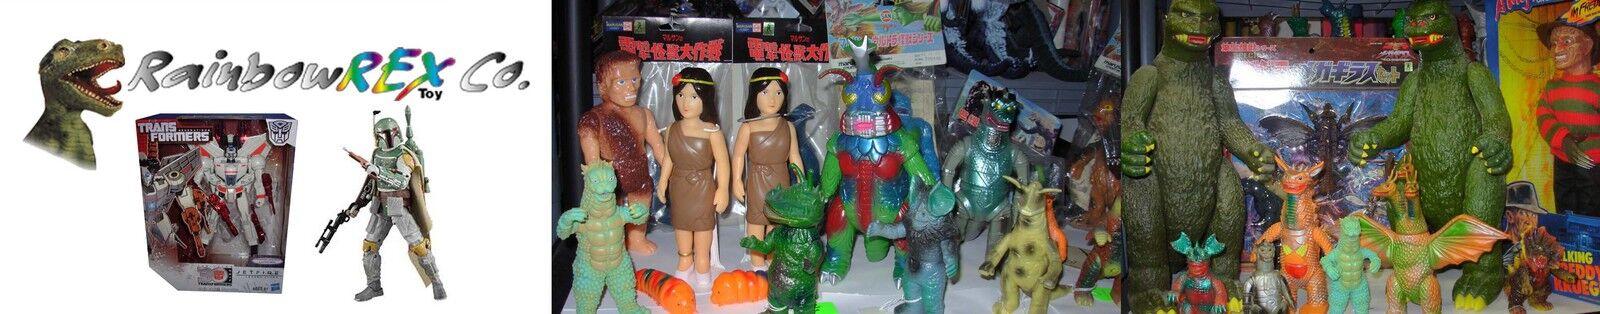 RainbowREX Toys